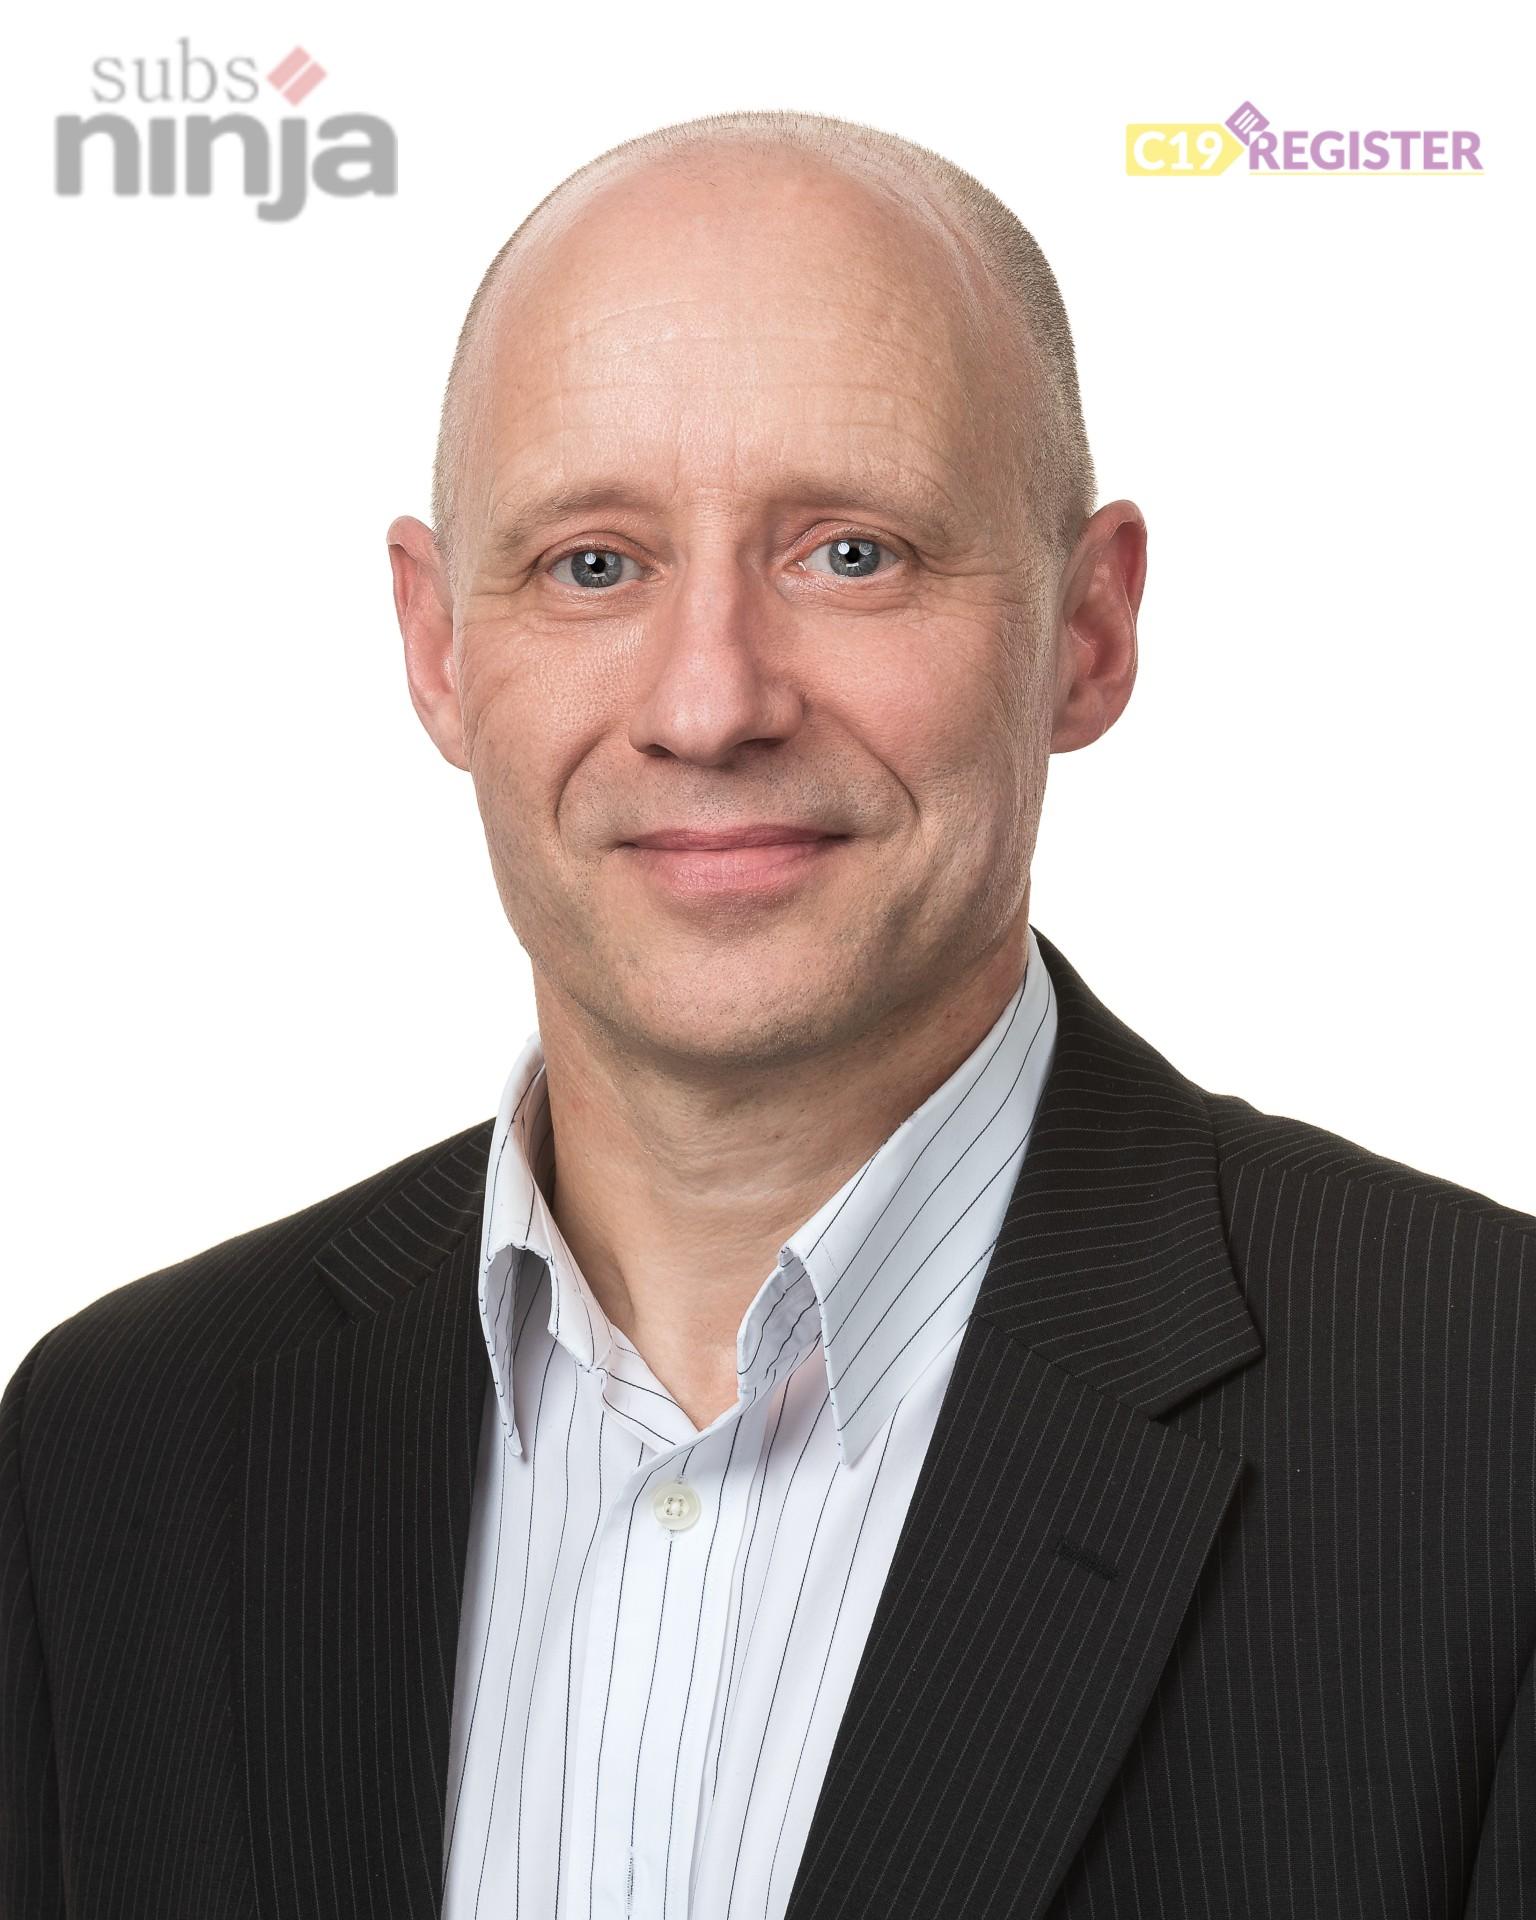 Jer Ryan  - CEO SubsNinja.com